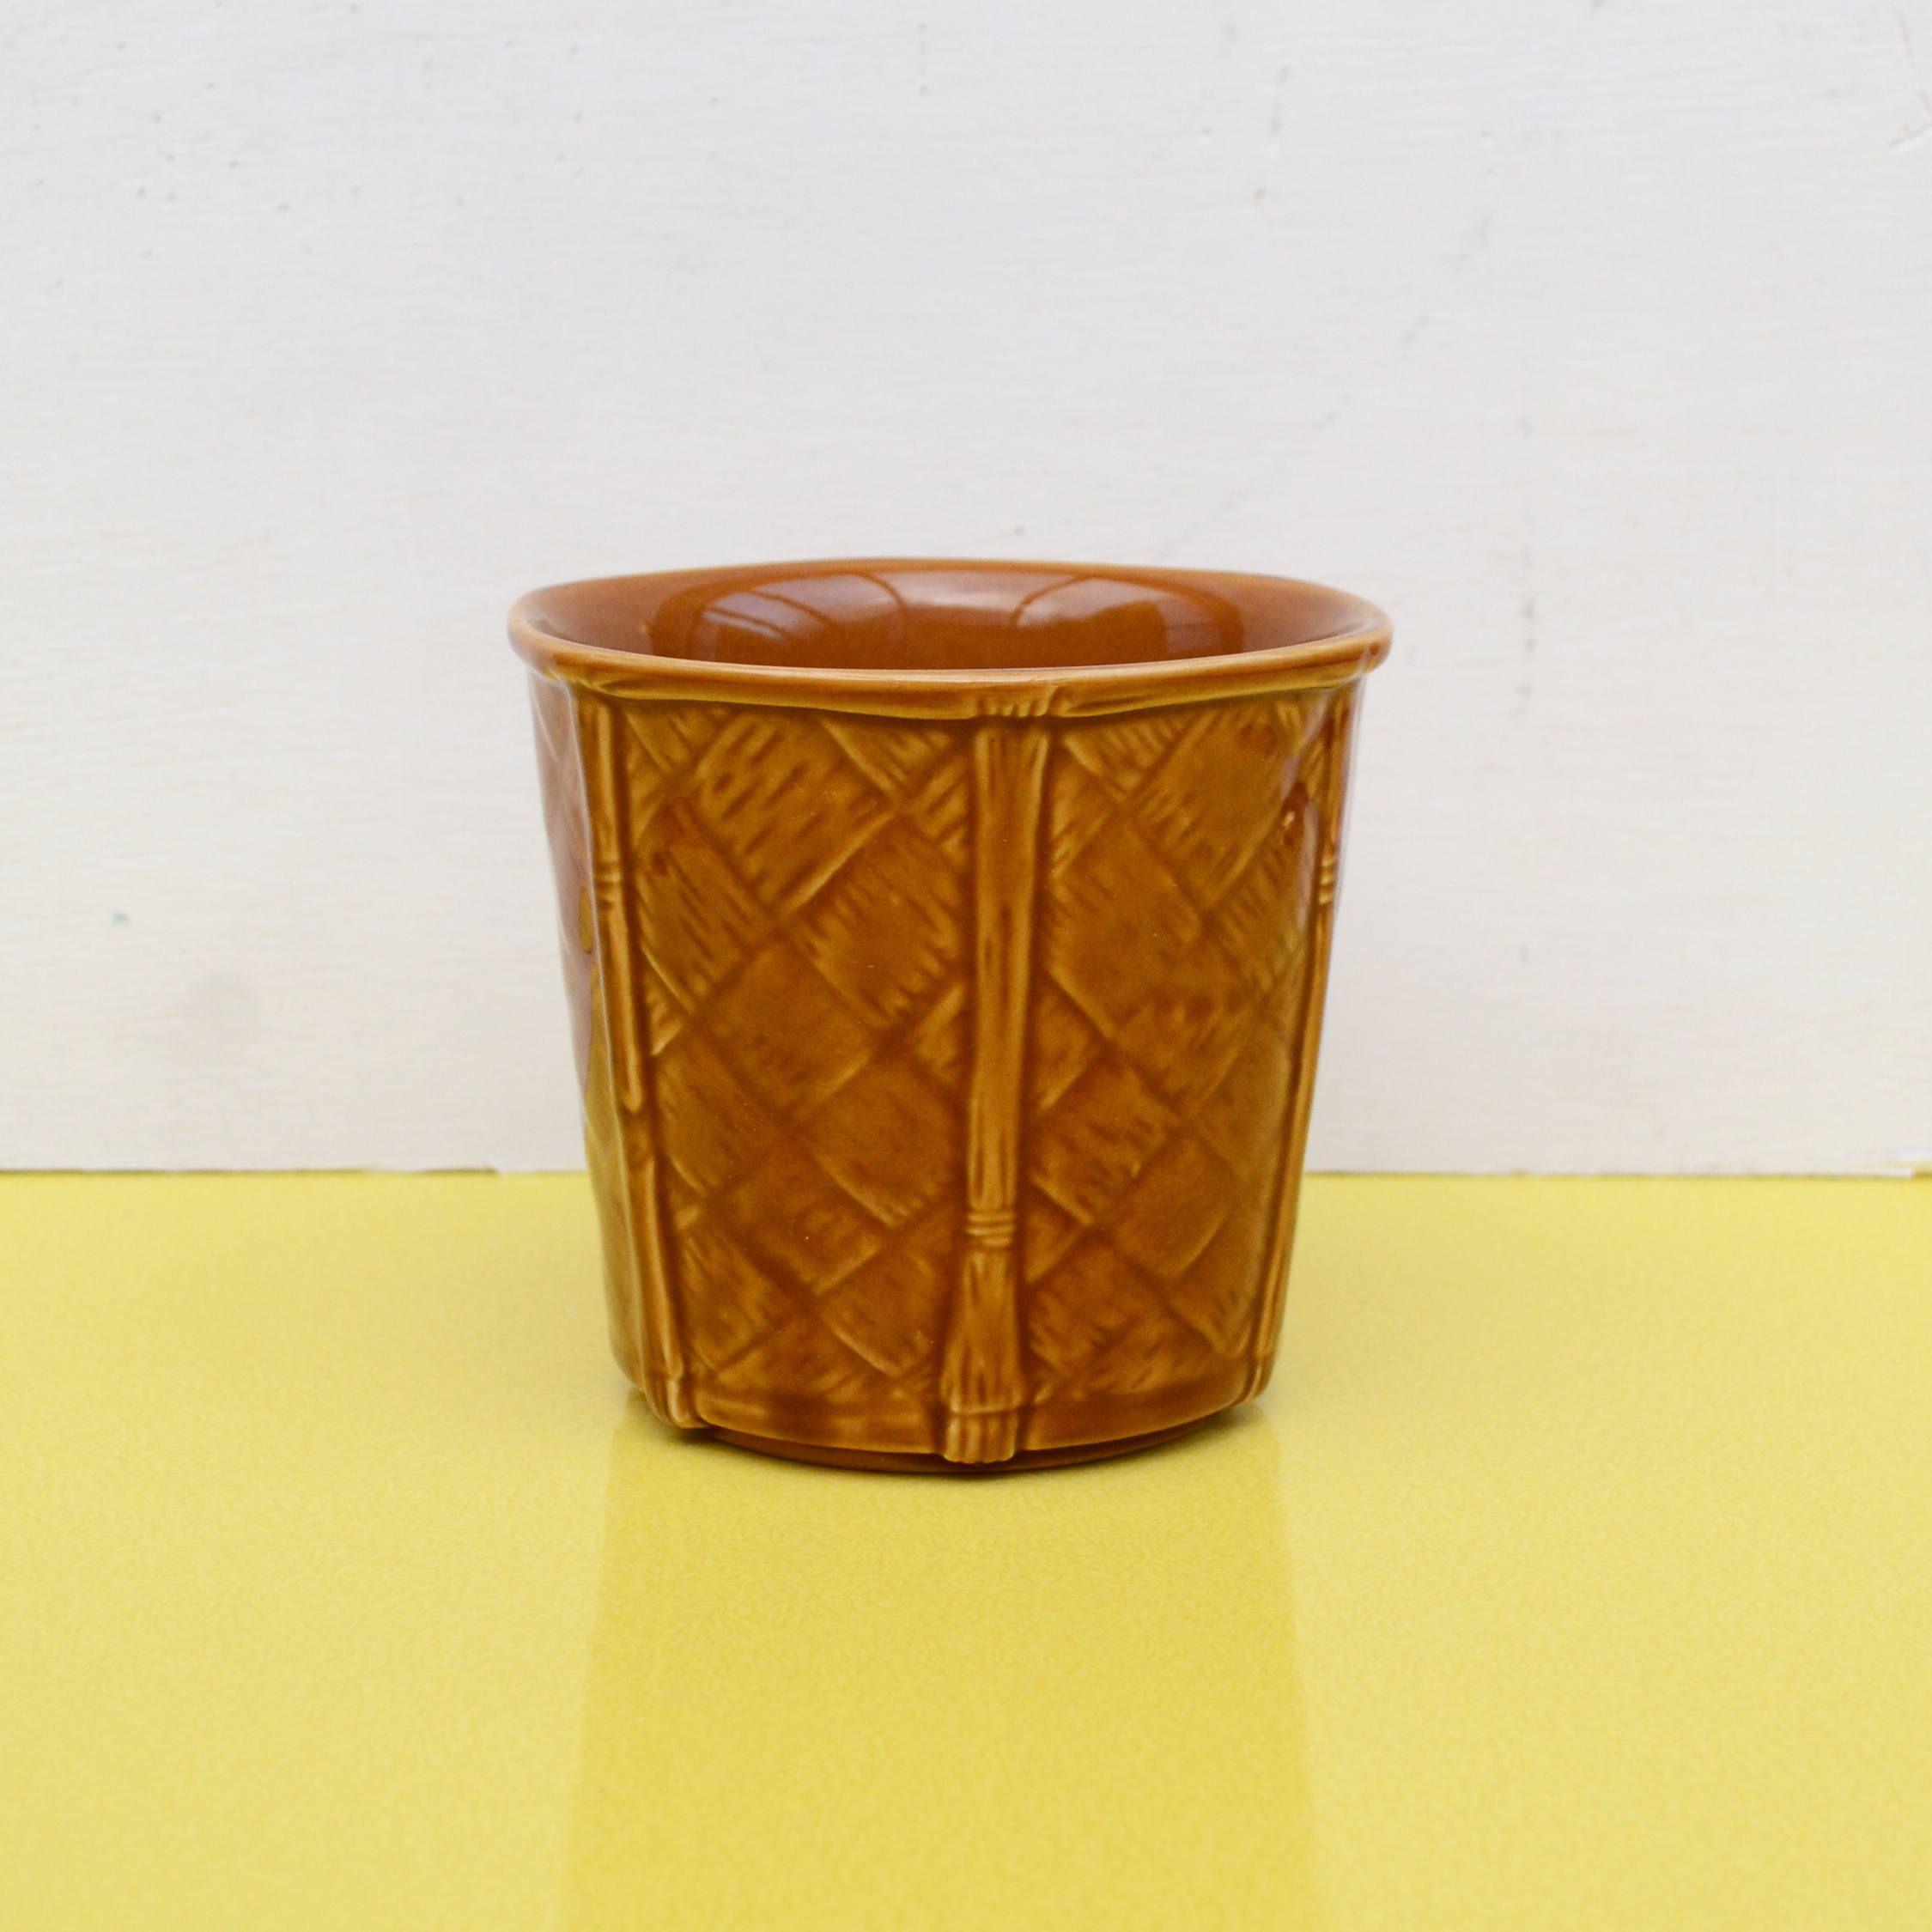 Vintage Ceramic Planter Churchill Pottery Brown Ceramic Plant Pot Indoor Planter Small Basket Weave St Ceramic Plant Pots Stoneware Planter Ceramic Planters